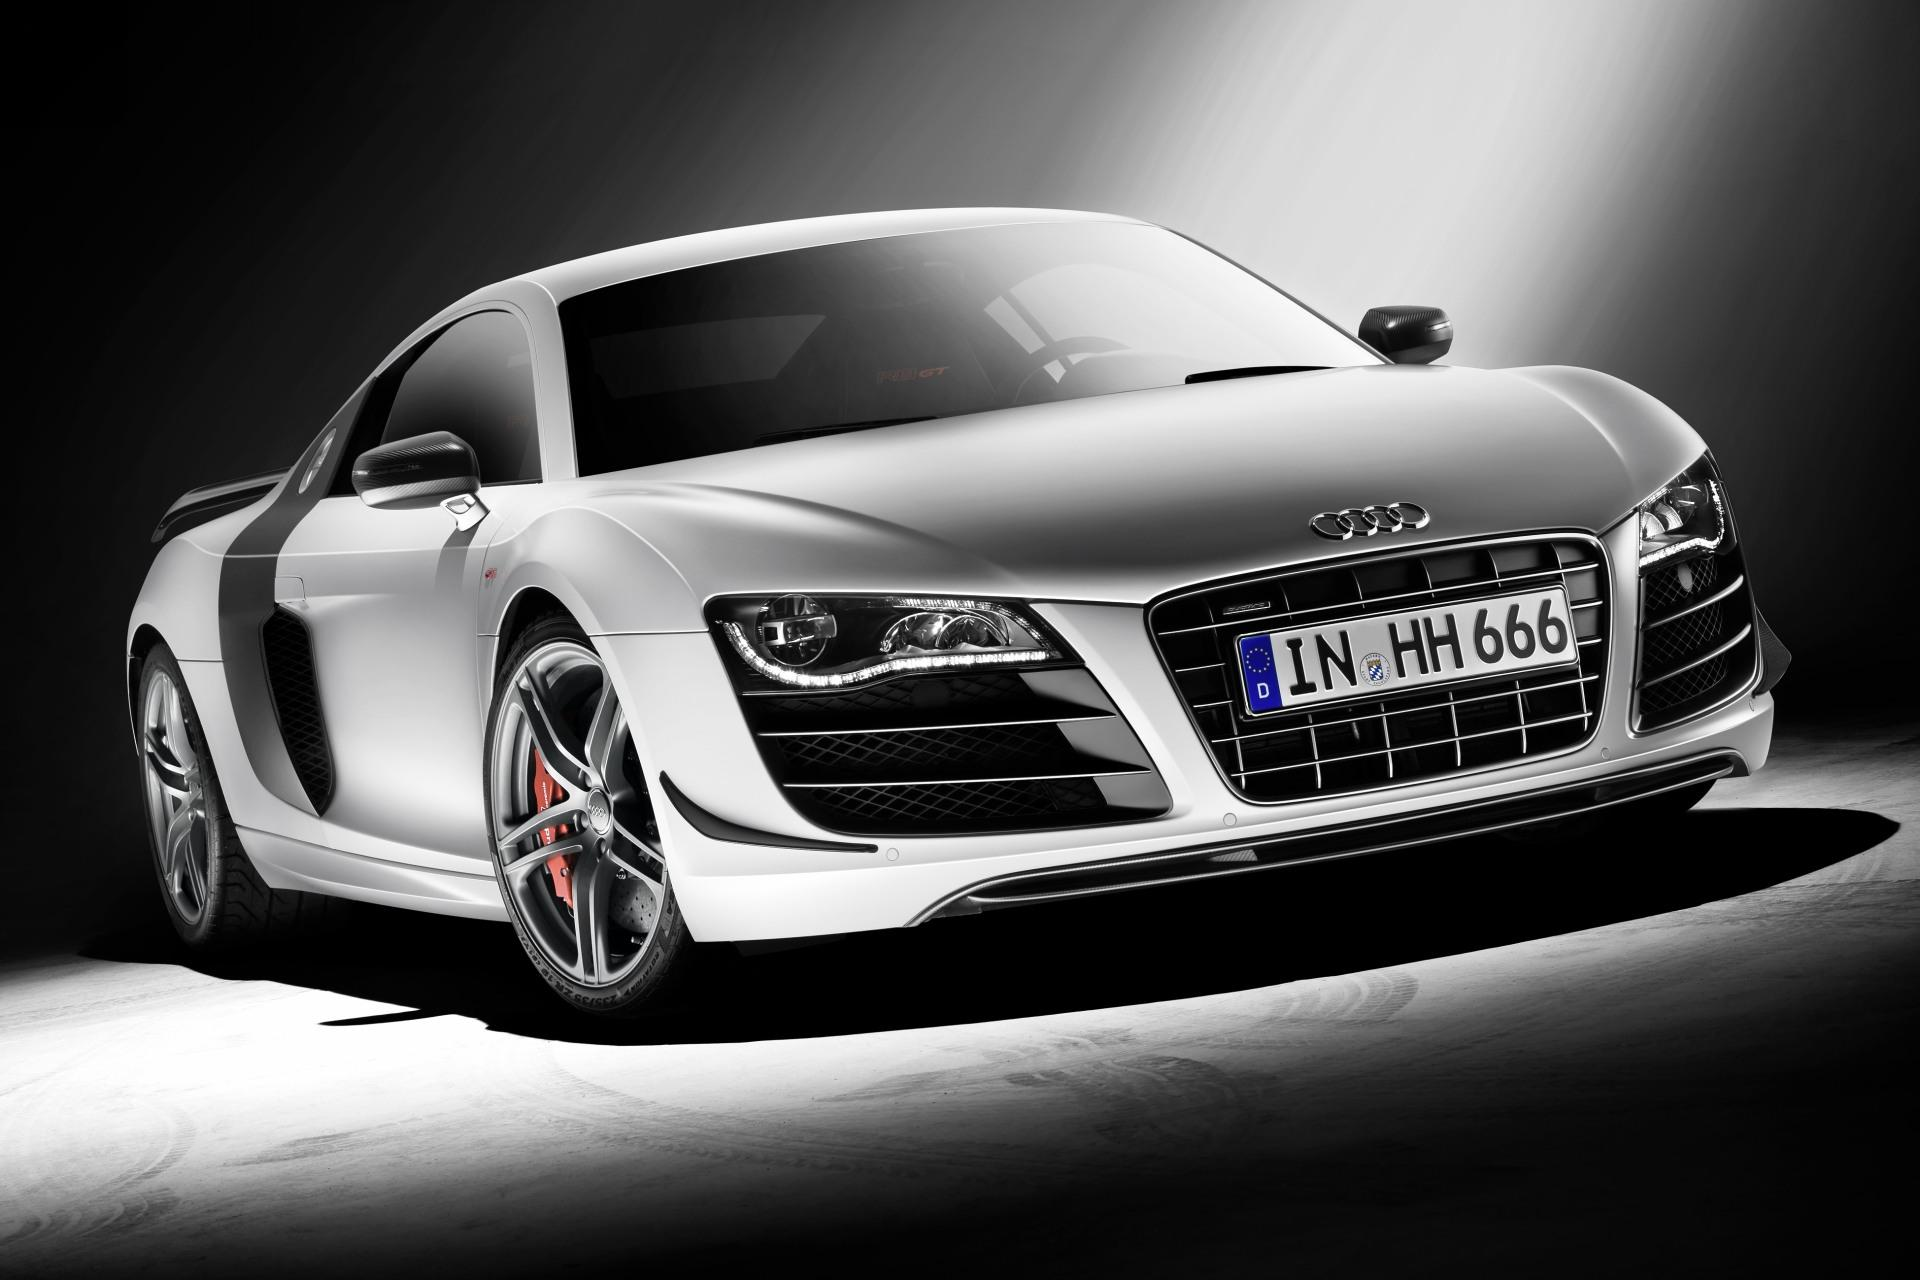 2010 Audi R8 GT News and Information | conceptcarz.com